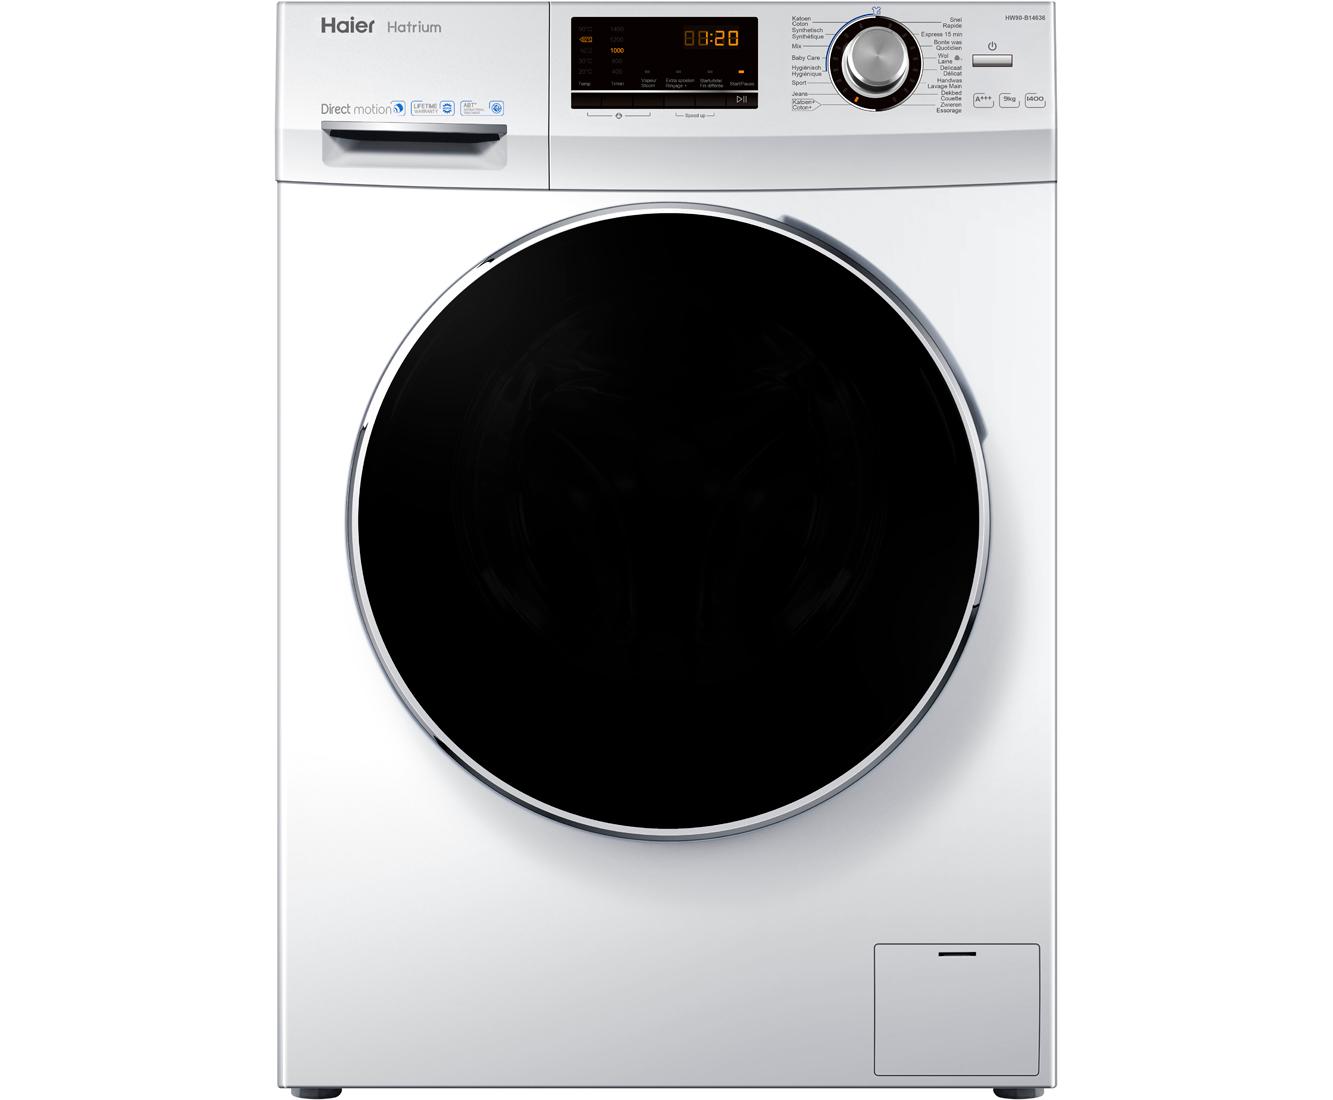 [Black Friday] Haier HW90-B14636 wasmachine voor €329 (na cashback) @ AO